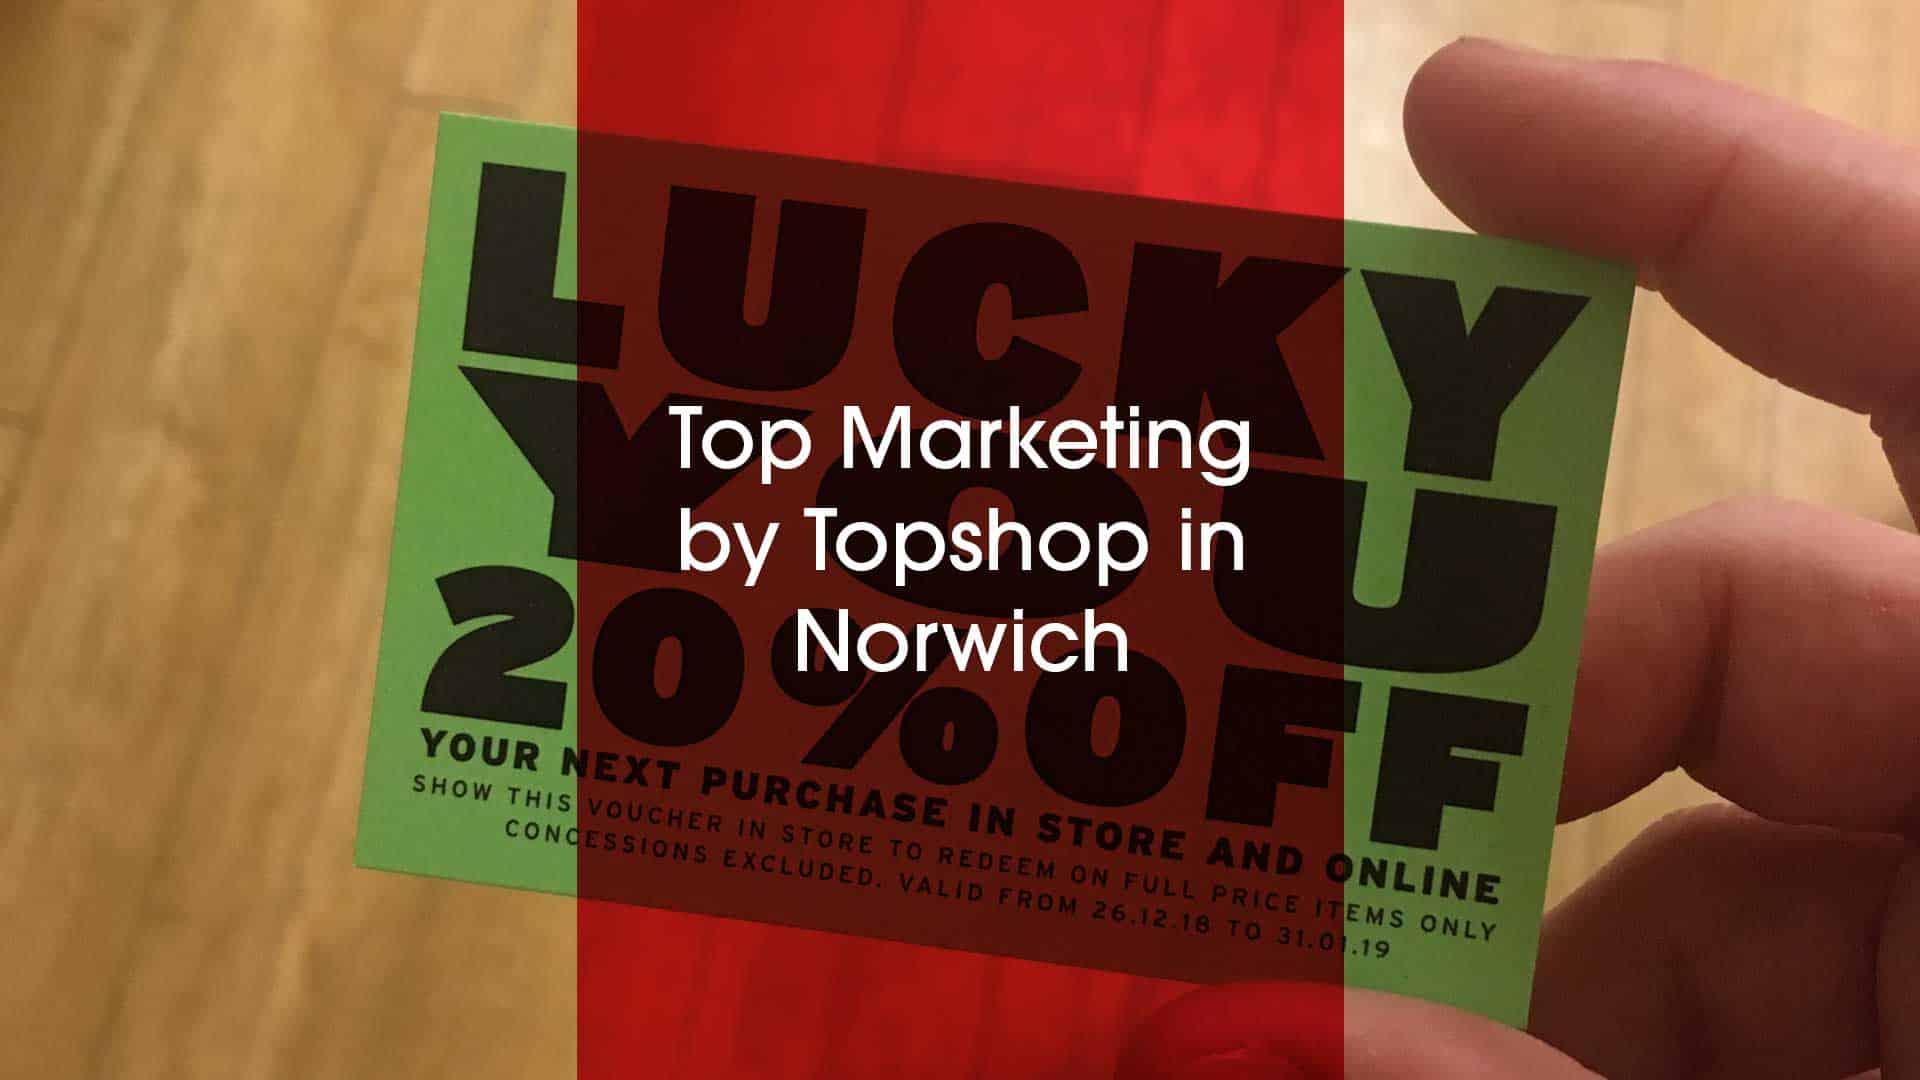 Topshop Norwich 20% off discount code voucher